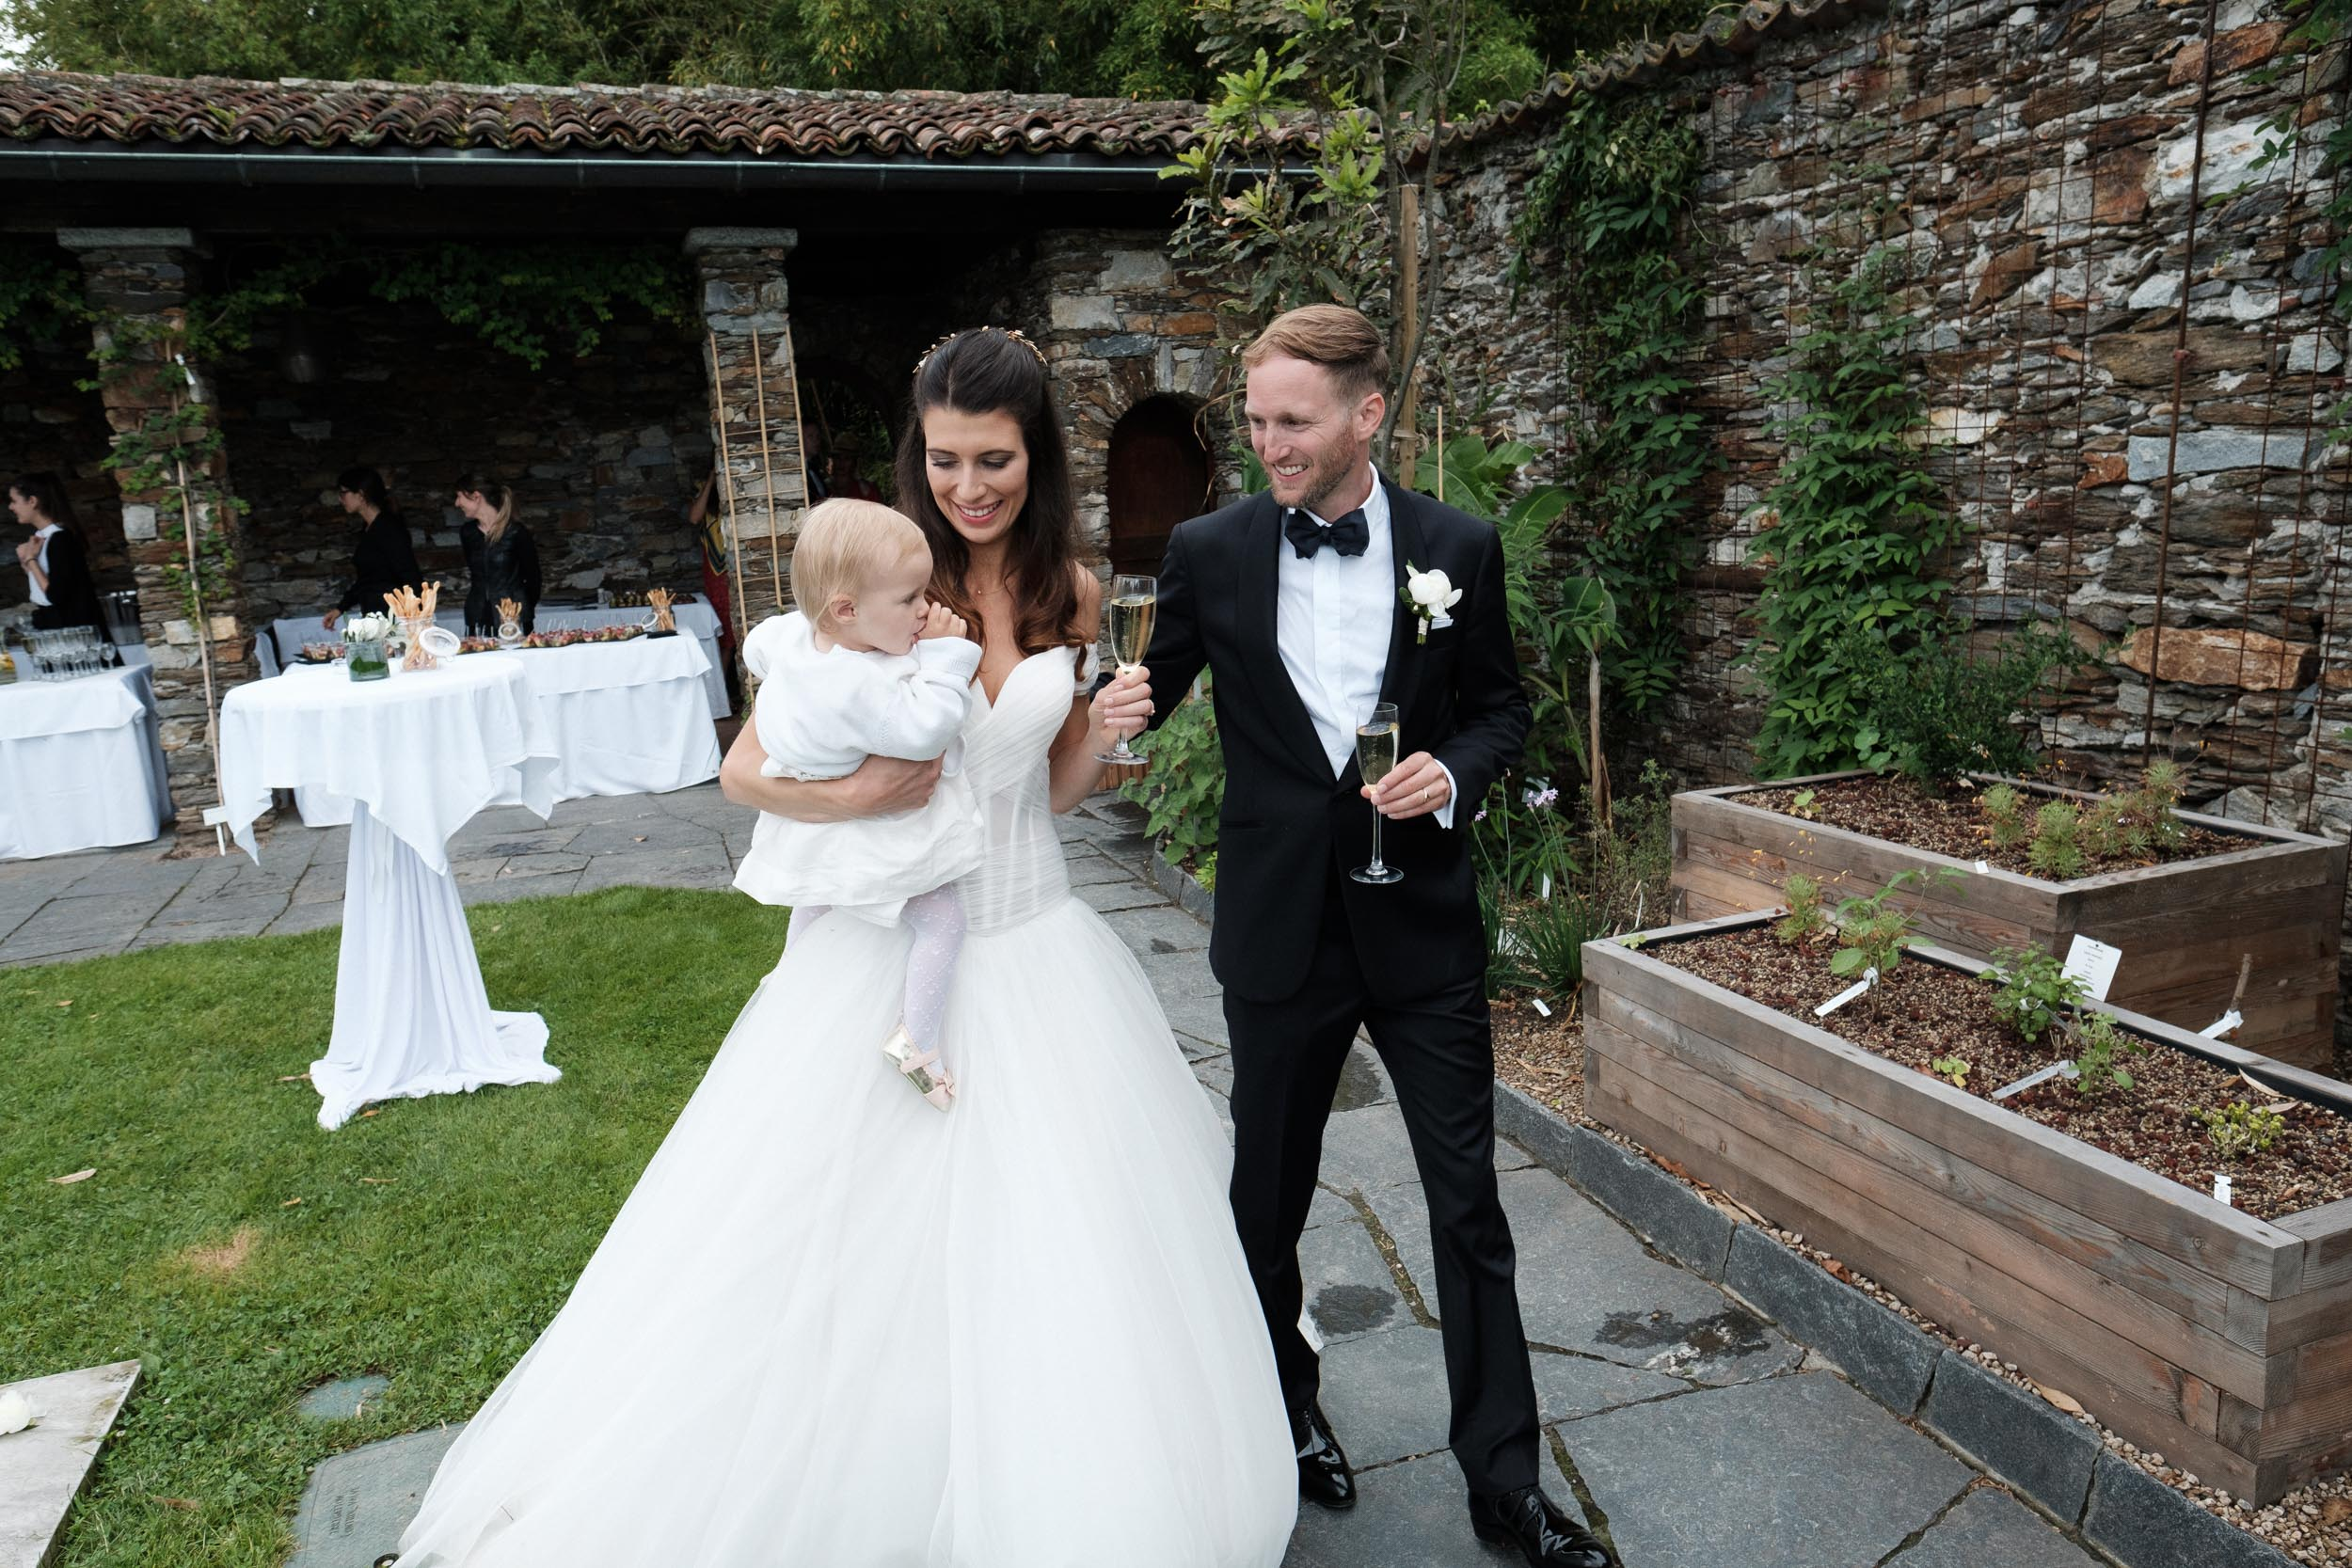 olivia-andreas-wedding-switzerland-336.jpg